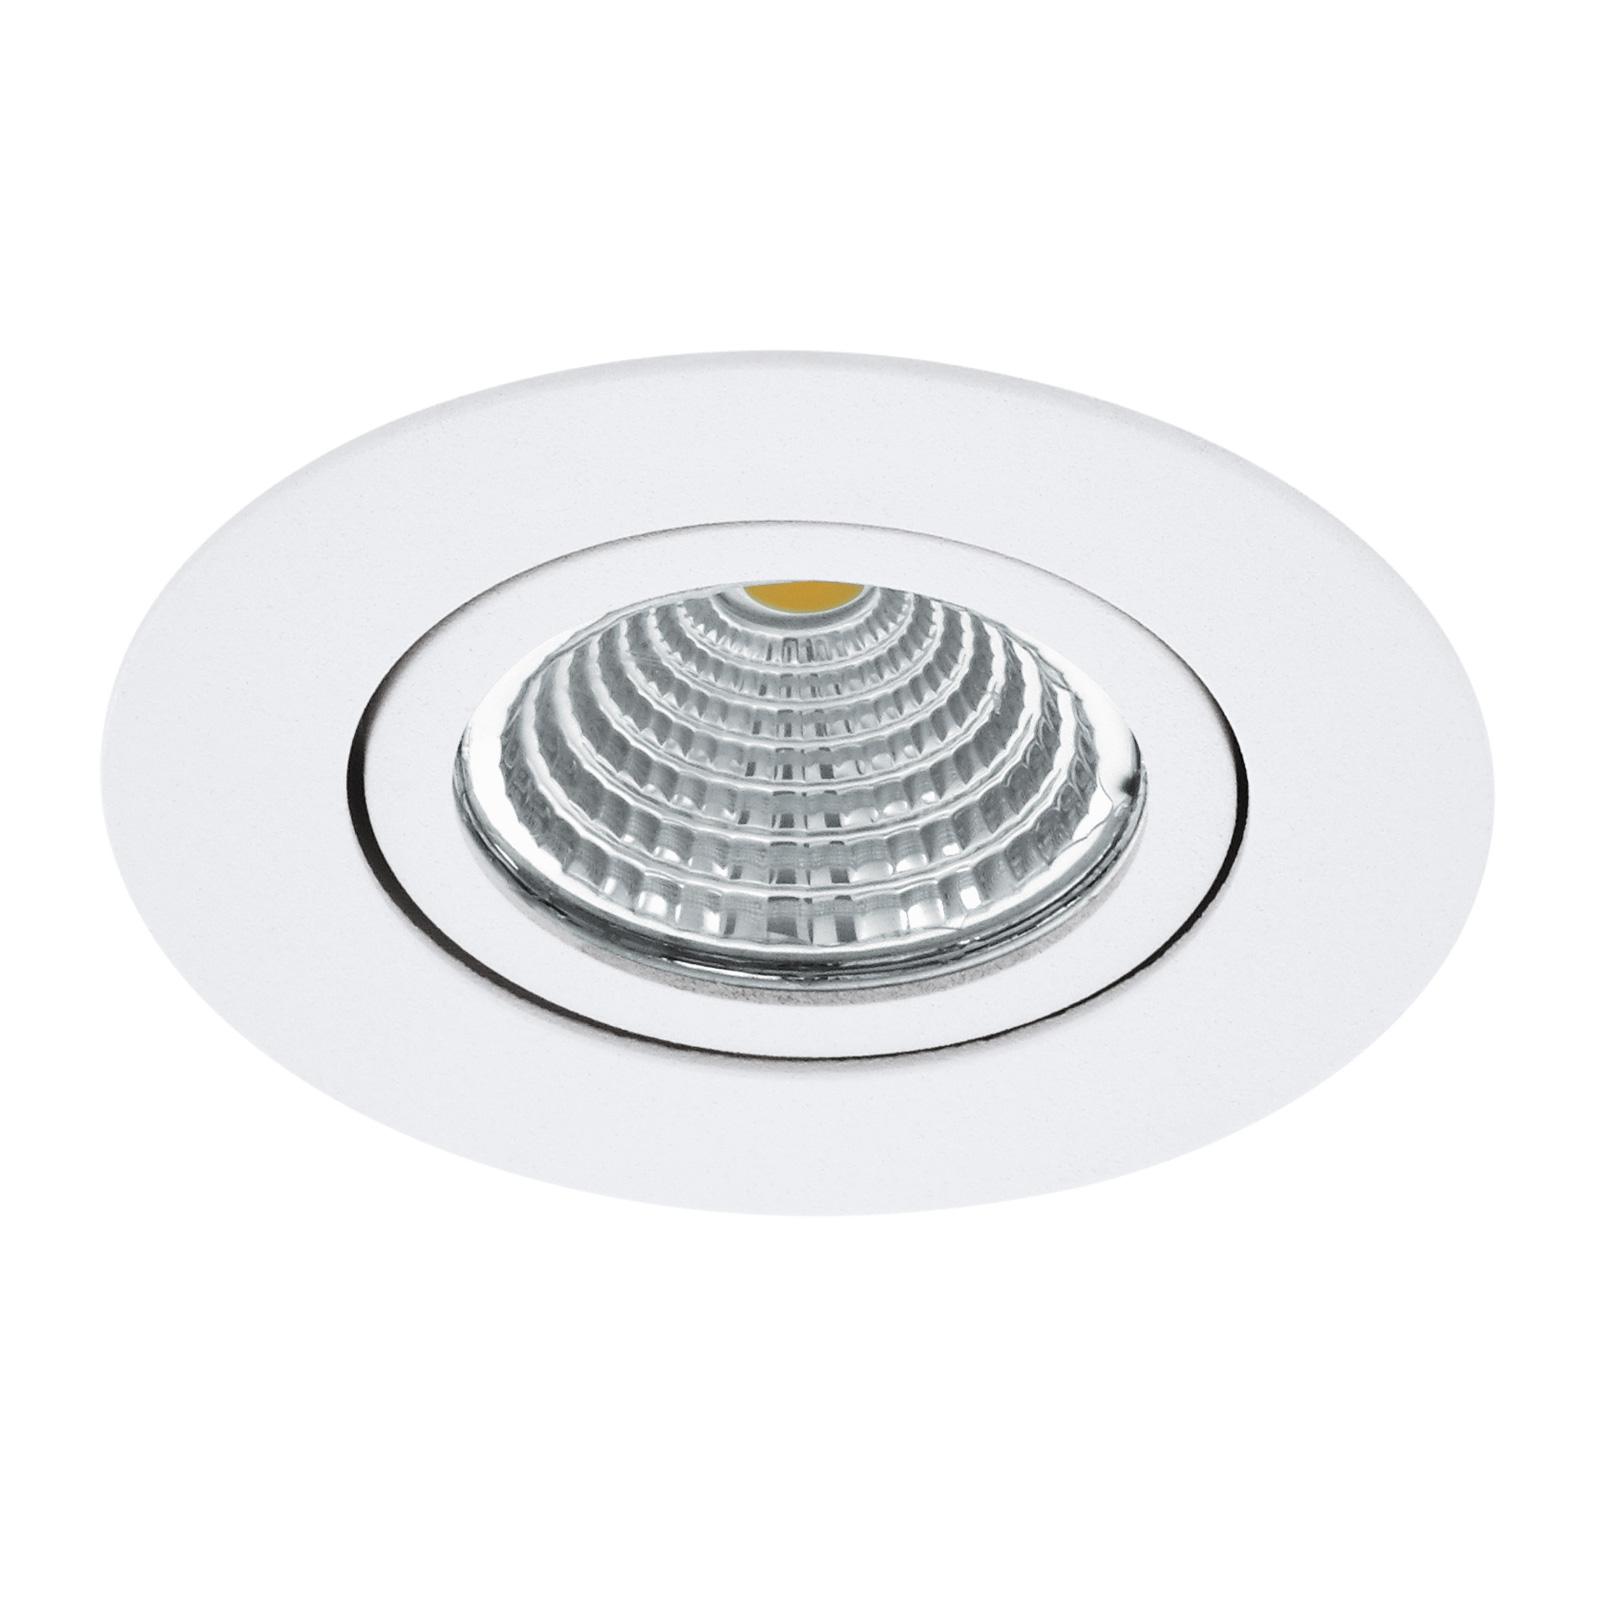 Foco LED Saliceto redondo giratorio 2.700K blanco